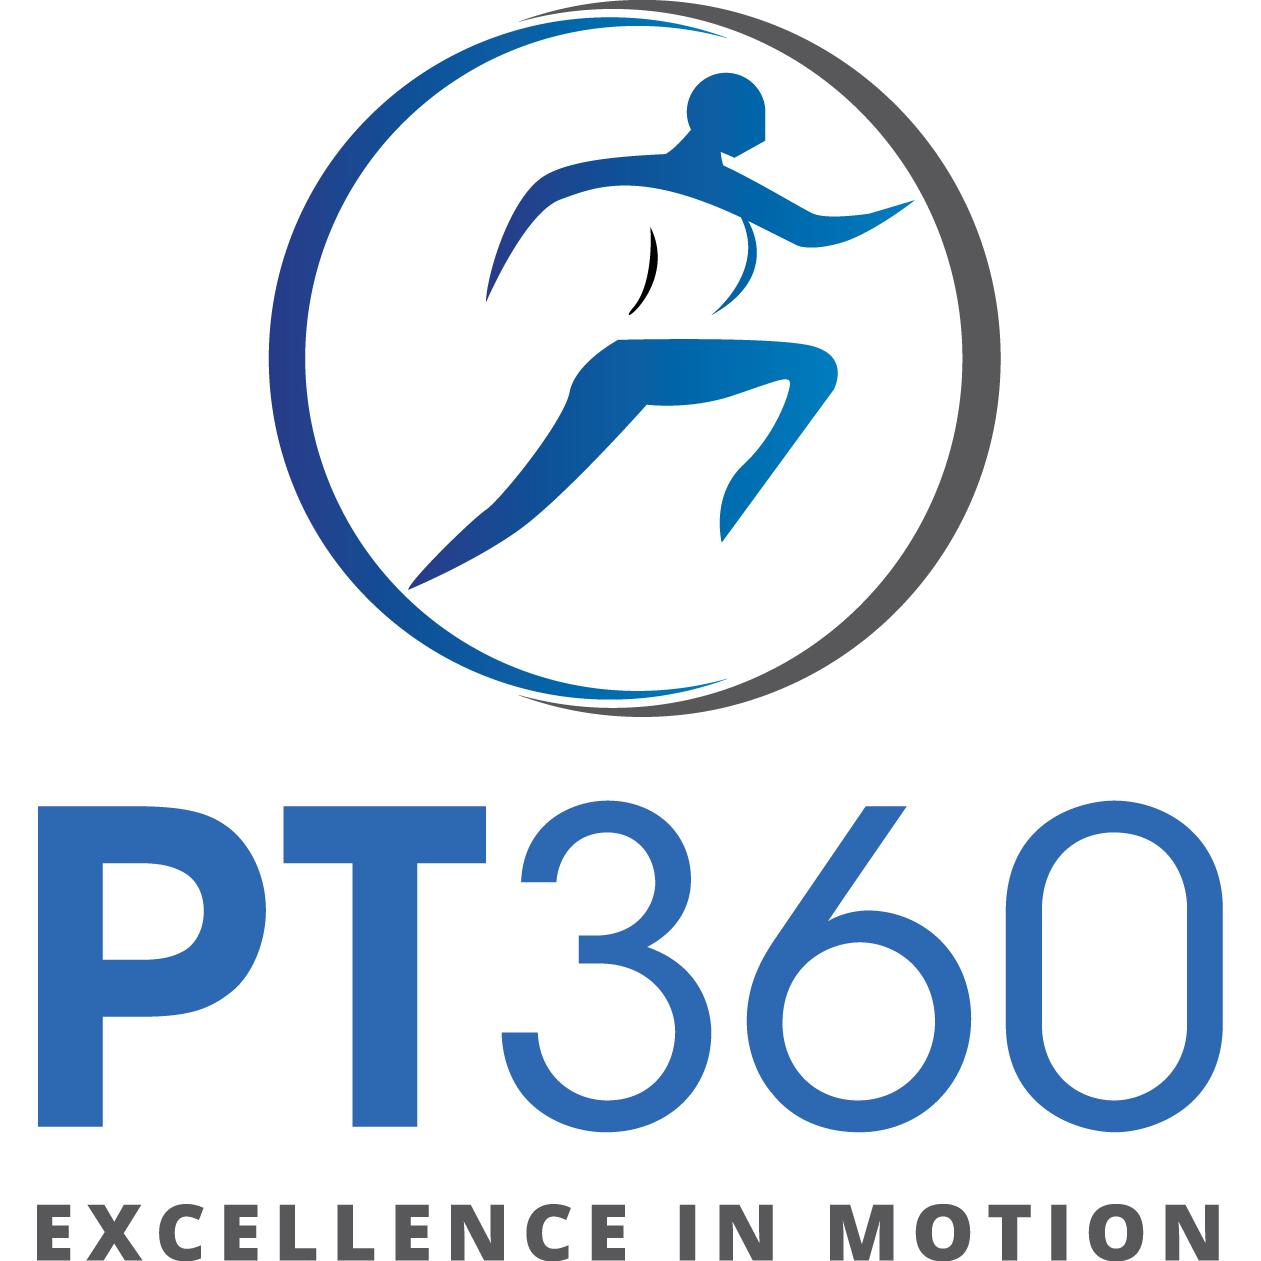 PT 360 image 0